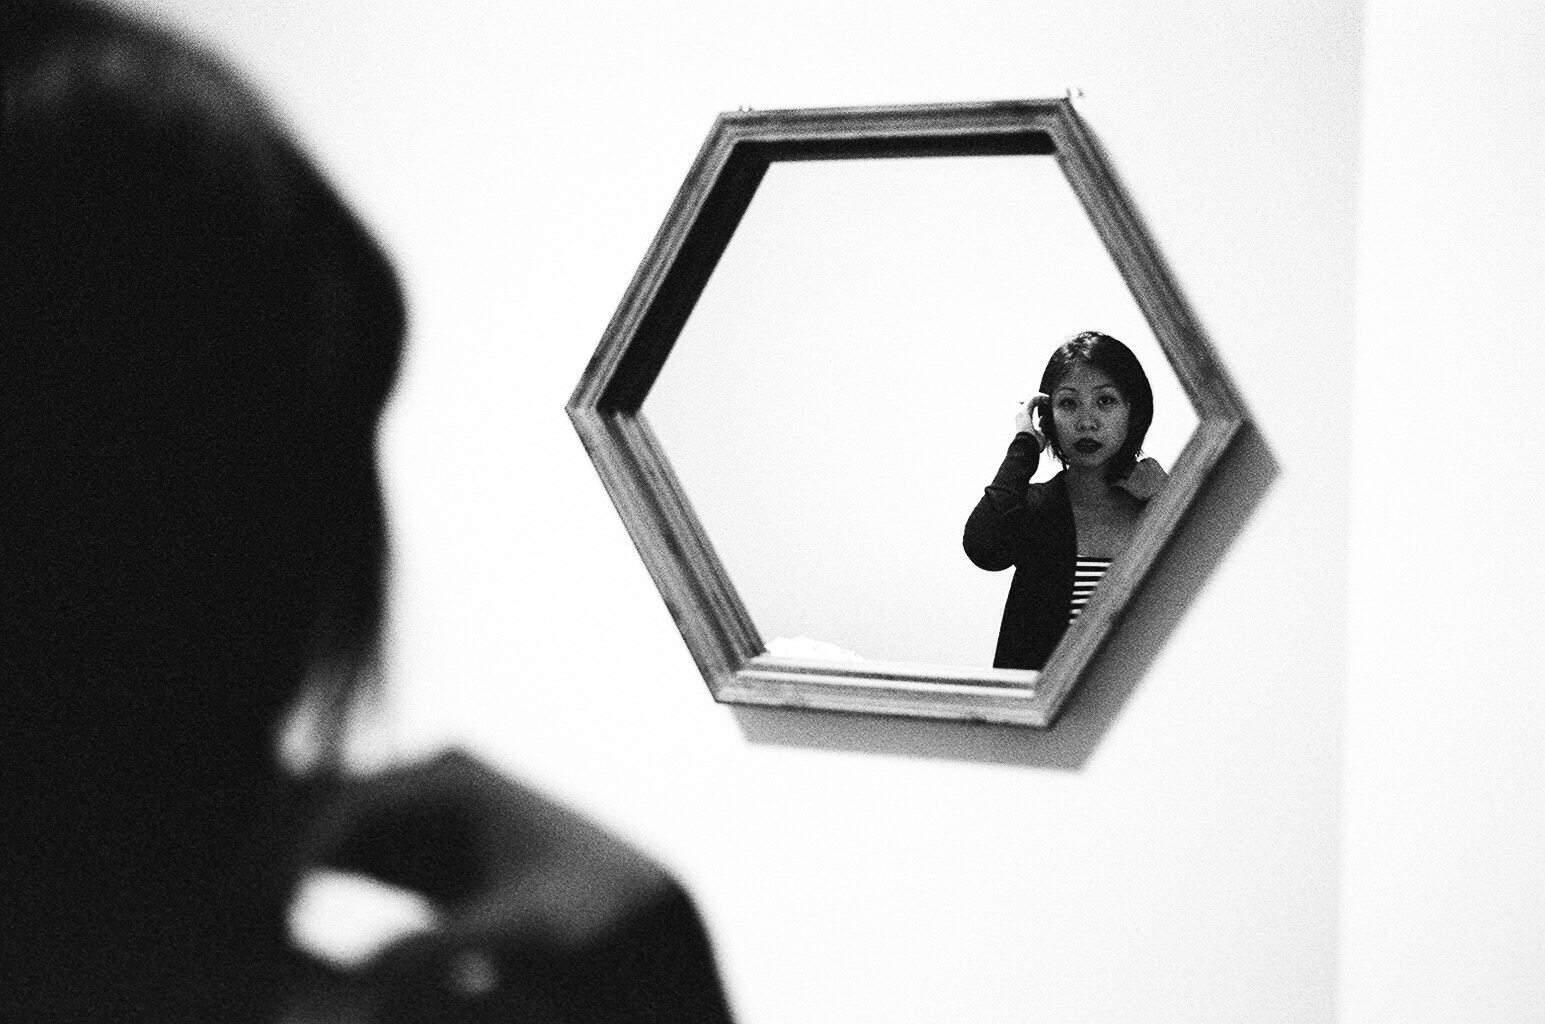 eric-kim-photography-cindy-project-berkeley